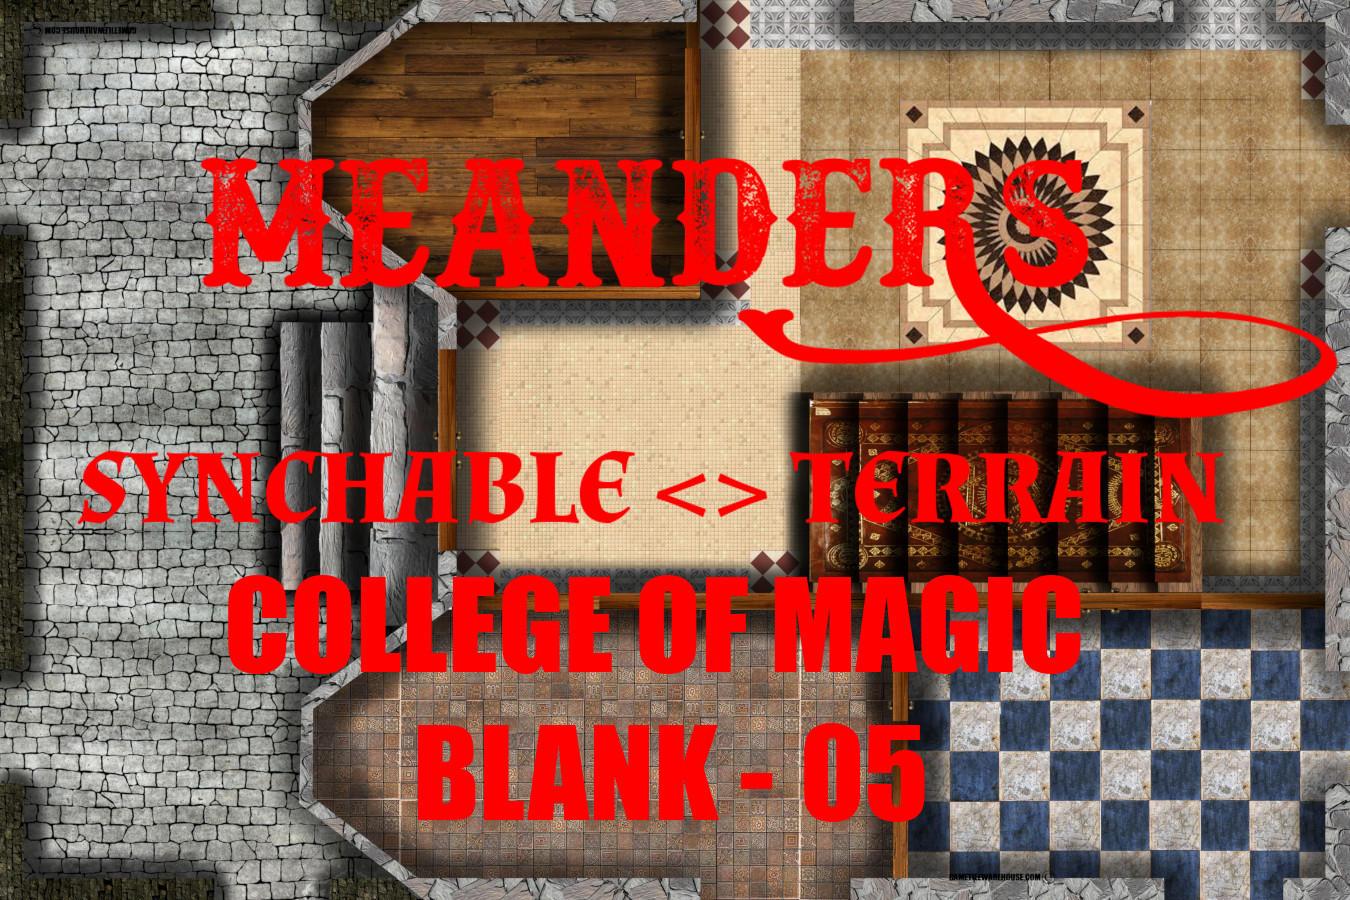 College of Magic Blank 05